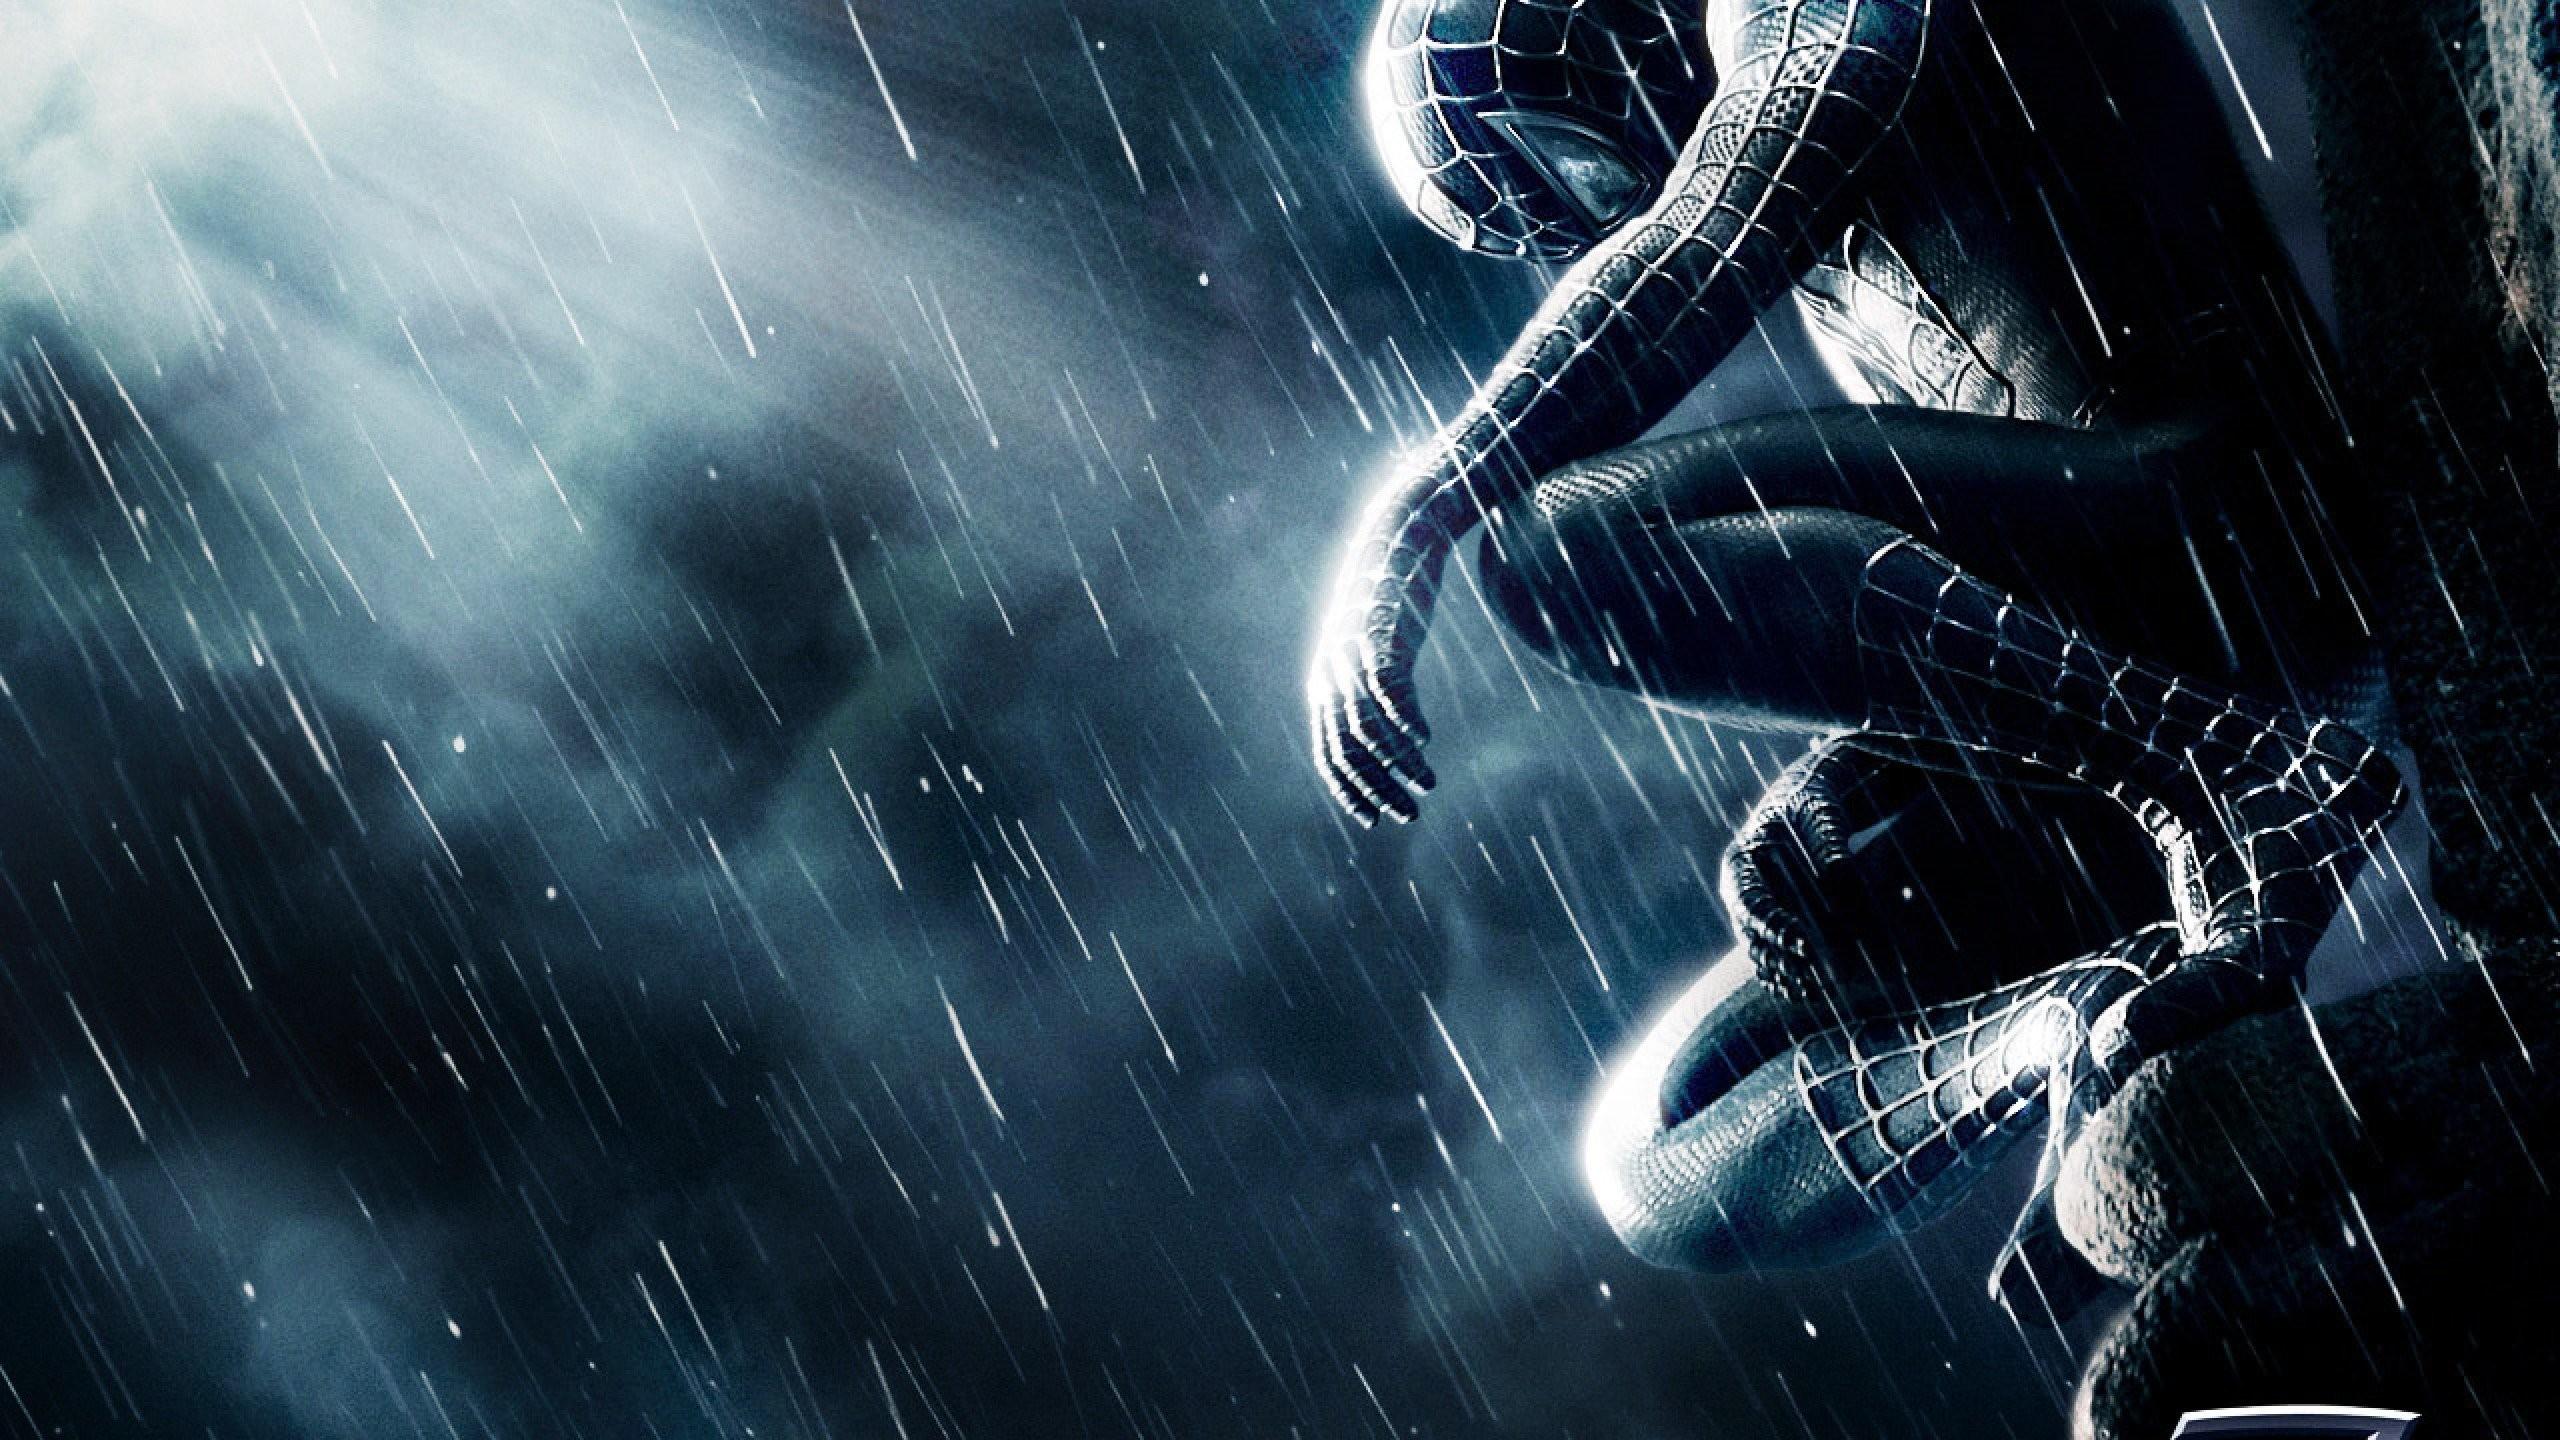 Wallpaper Vidur Net Spider Man 3 Wallpaper Hd 2560x1440 Wallpaper Teahub Io